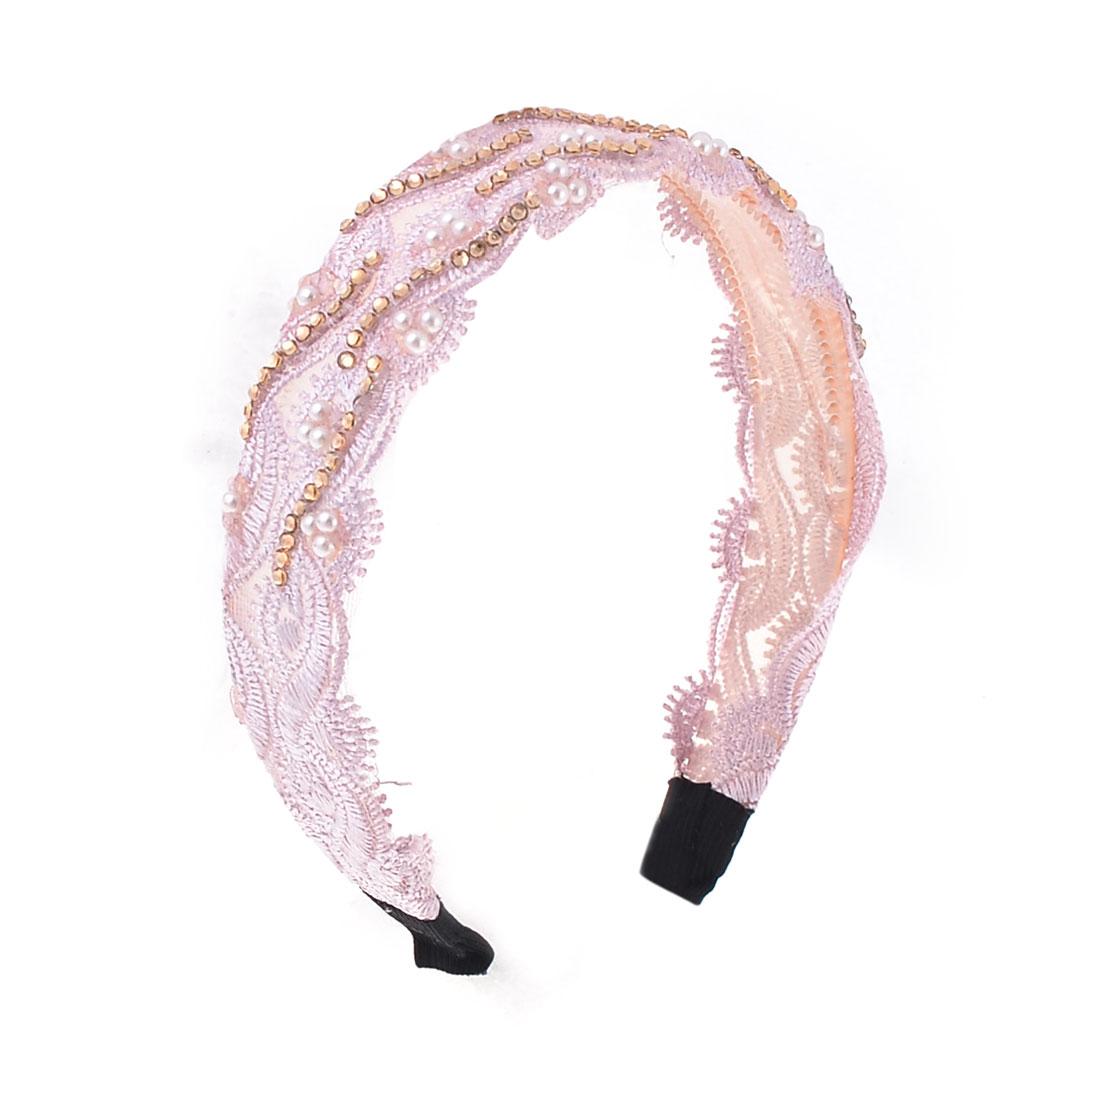 Ladies Gold Tone Faux Rinestones Decor Nylon Covered Headband Hair Hoop